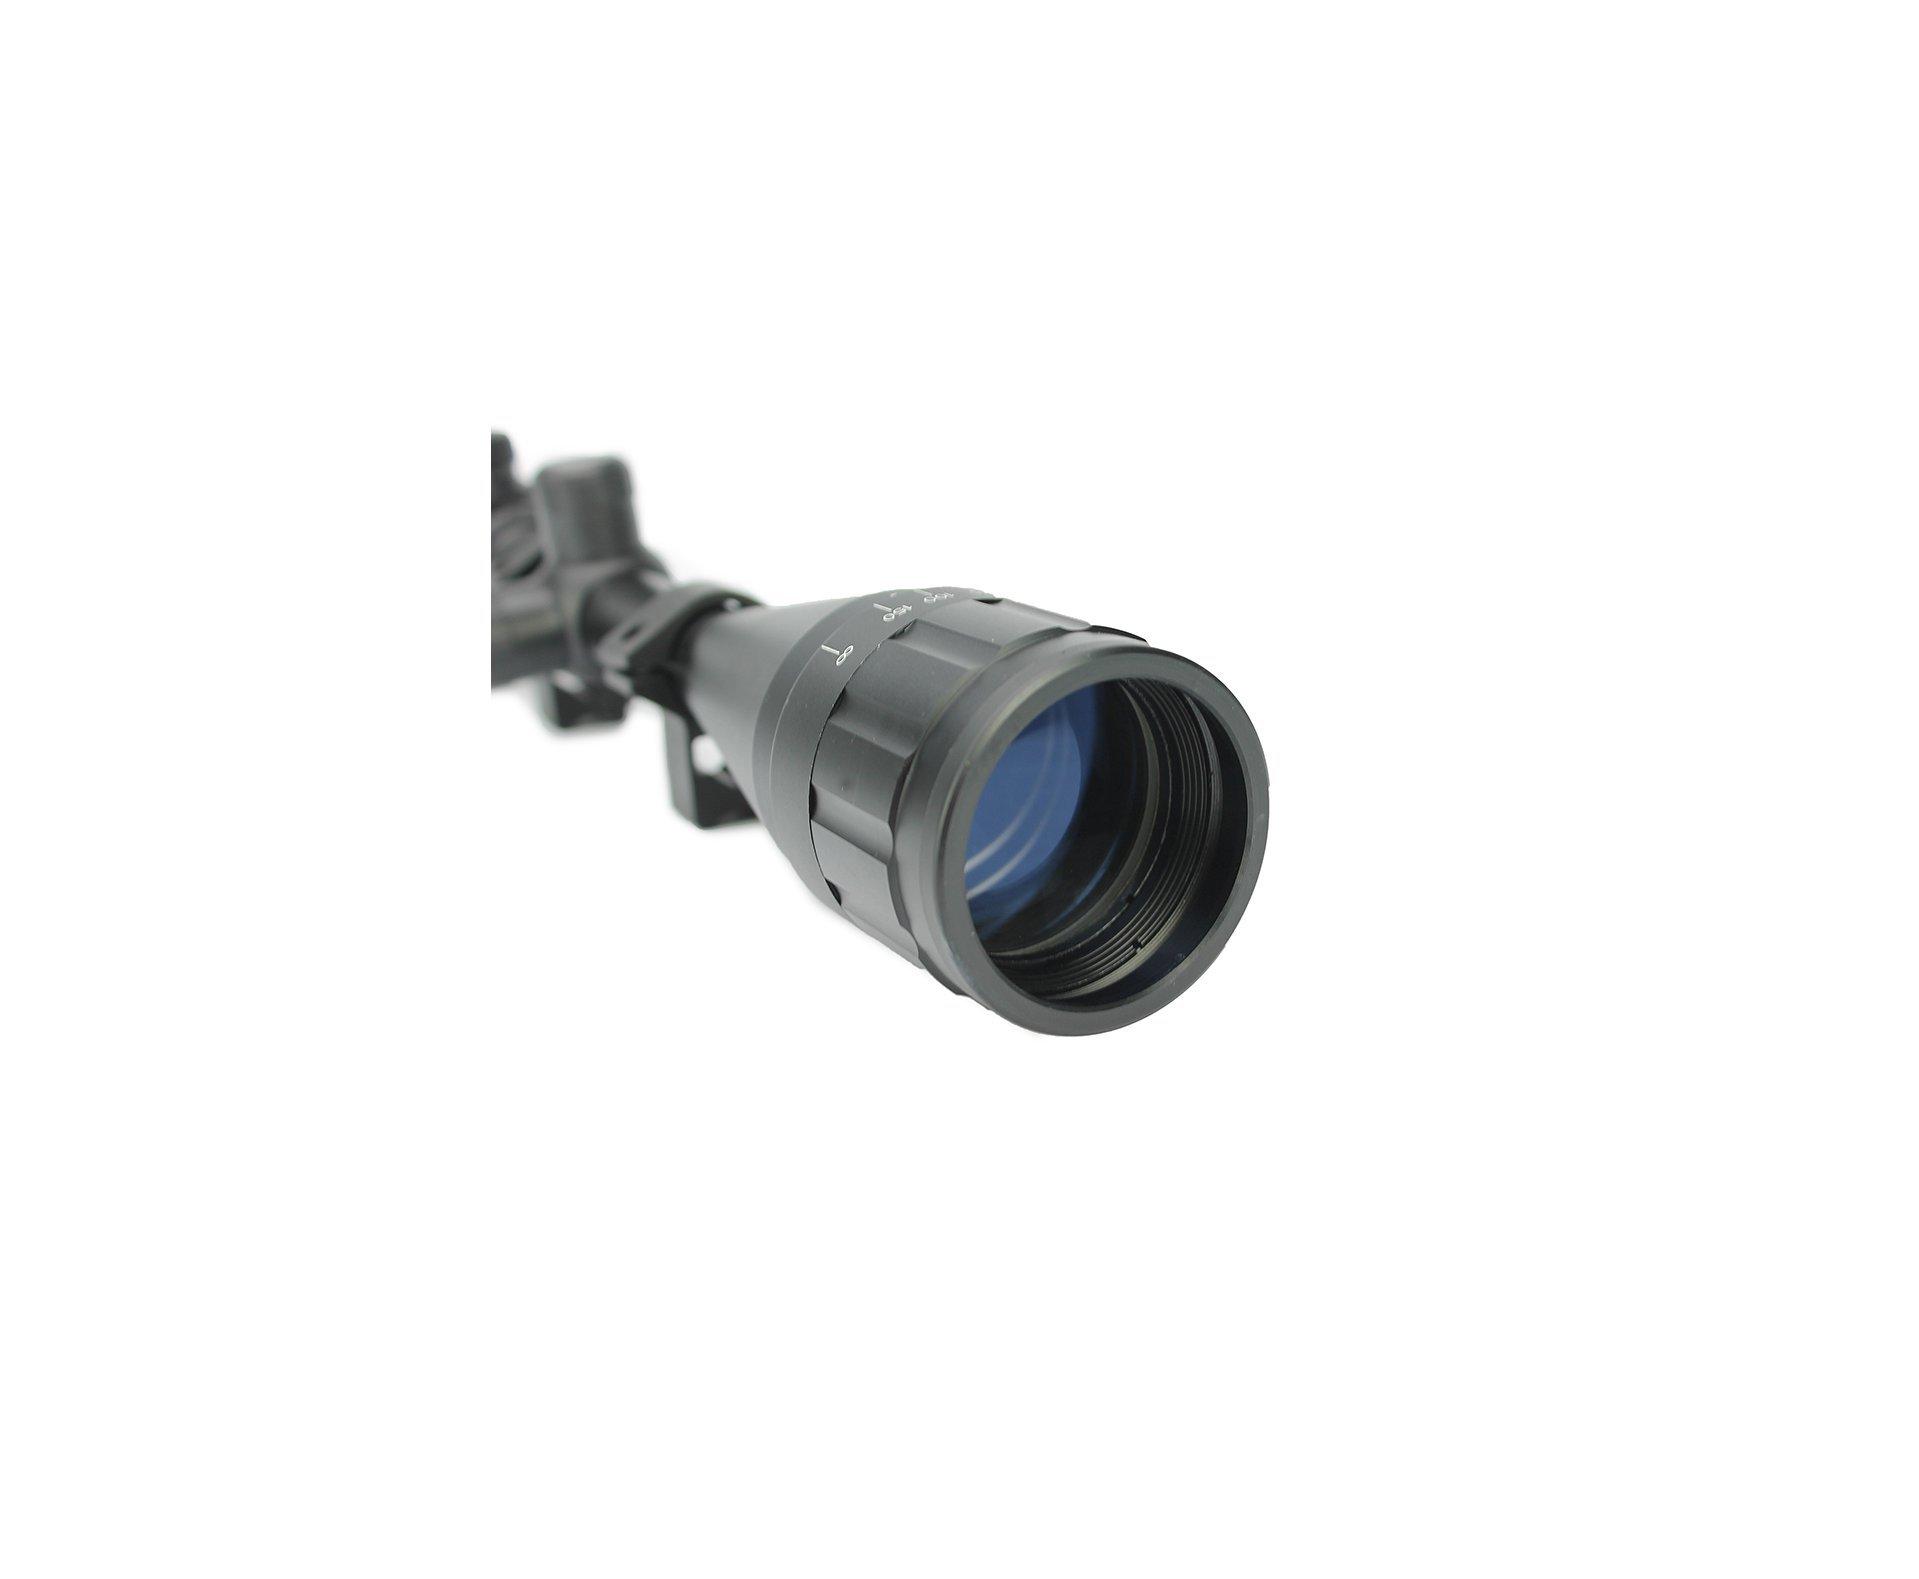 Luneta 4-16x50 Aoe Mil Dot E Paralax Mount 11mm Spa Artemis - Fxr